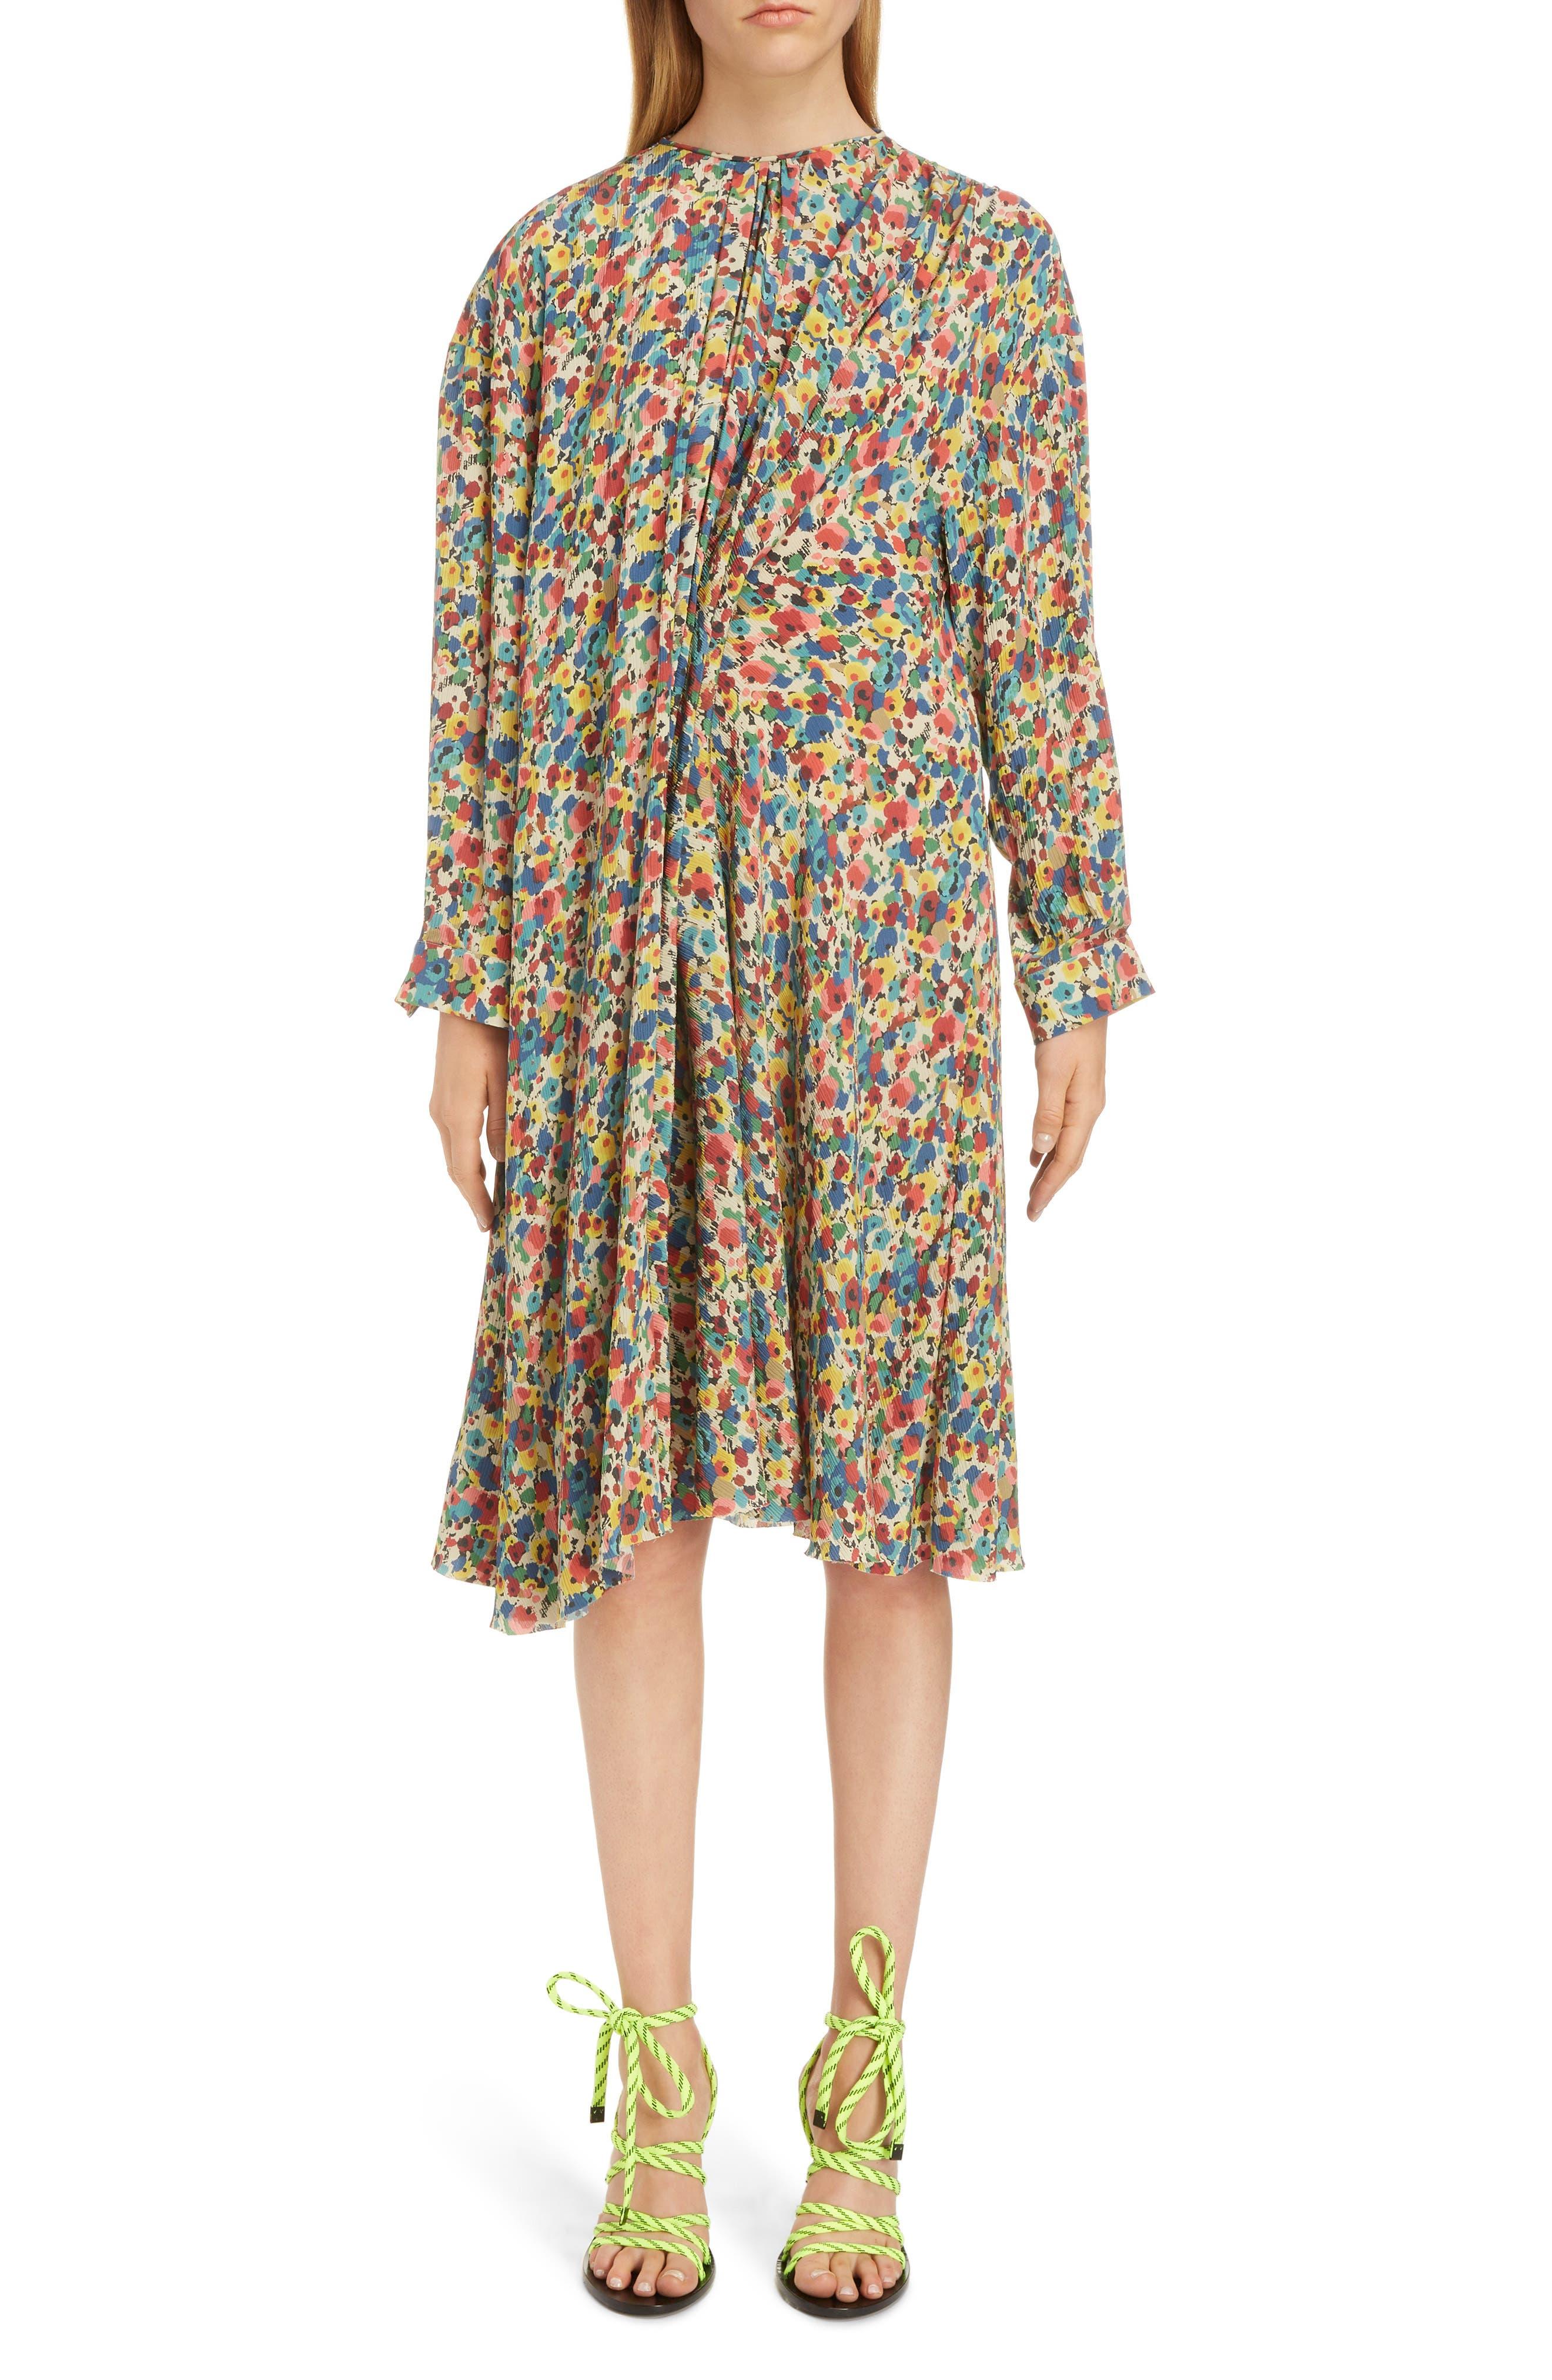 Balenciaga Floral Print Silk Dress, US / 44 FR - Red